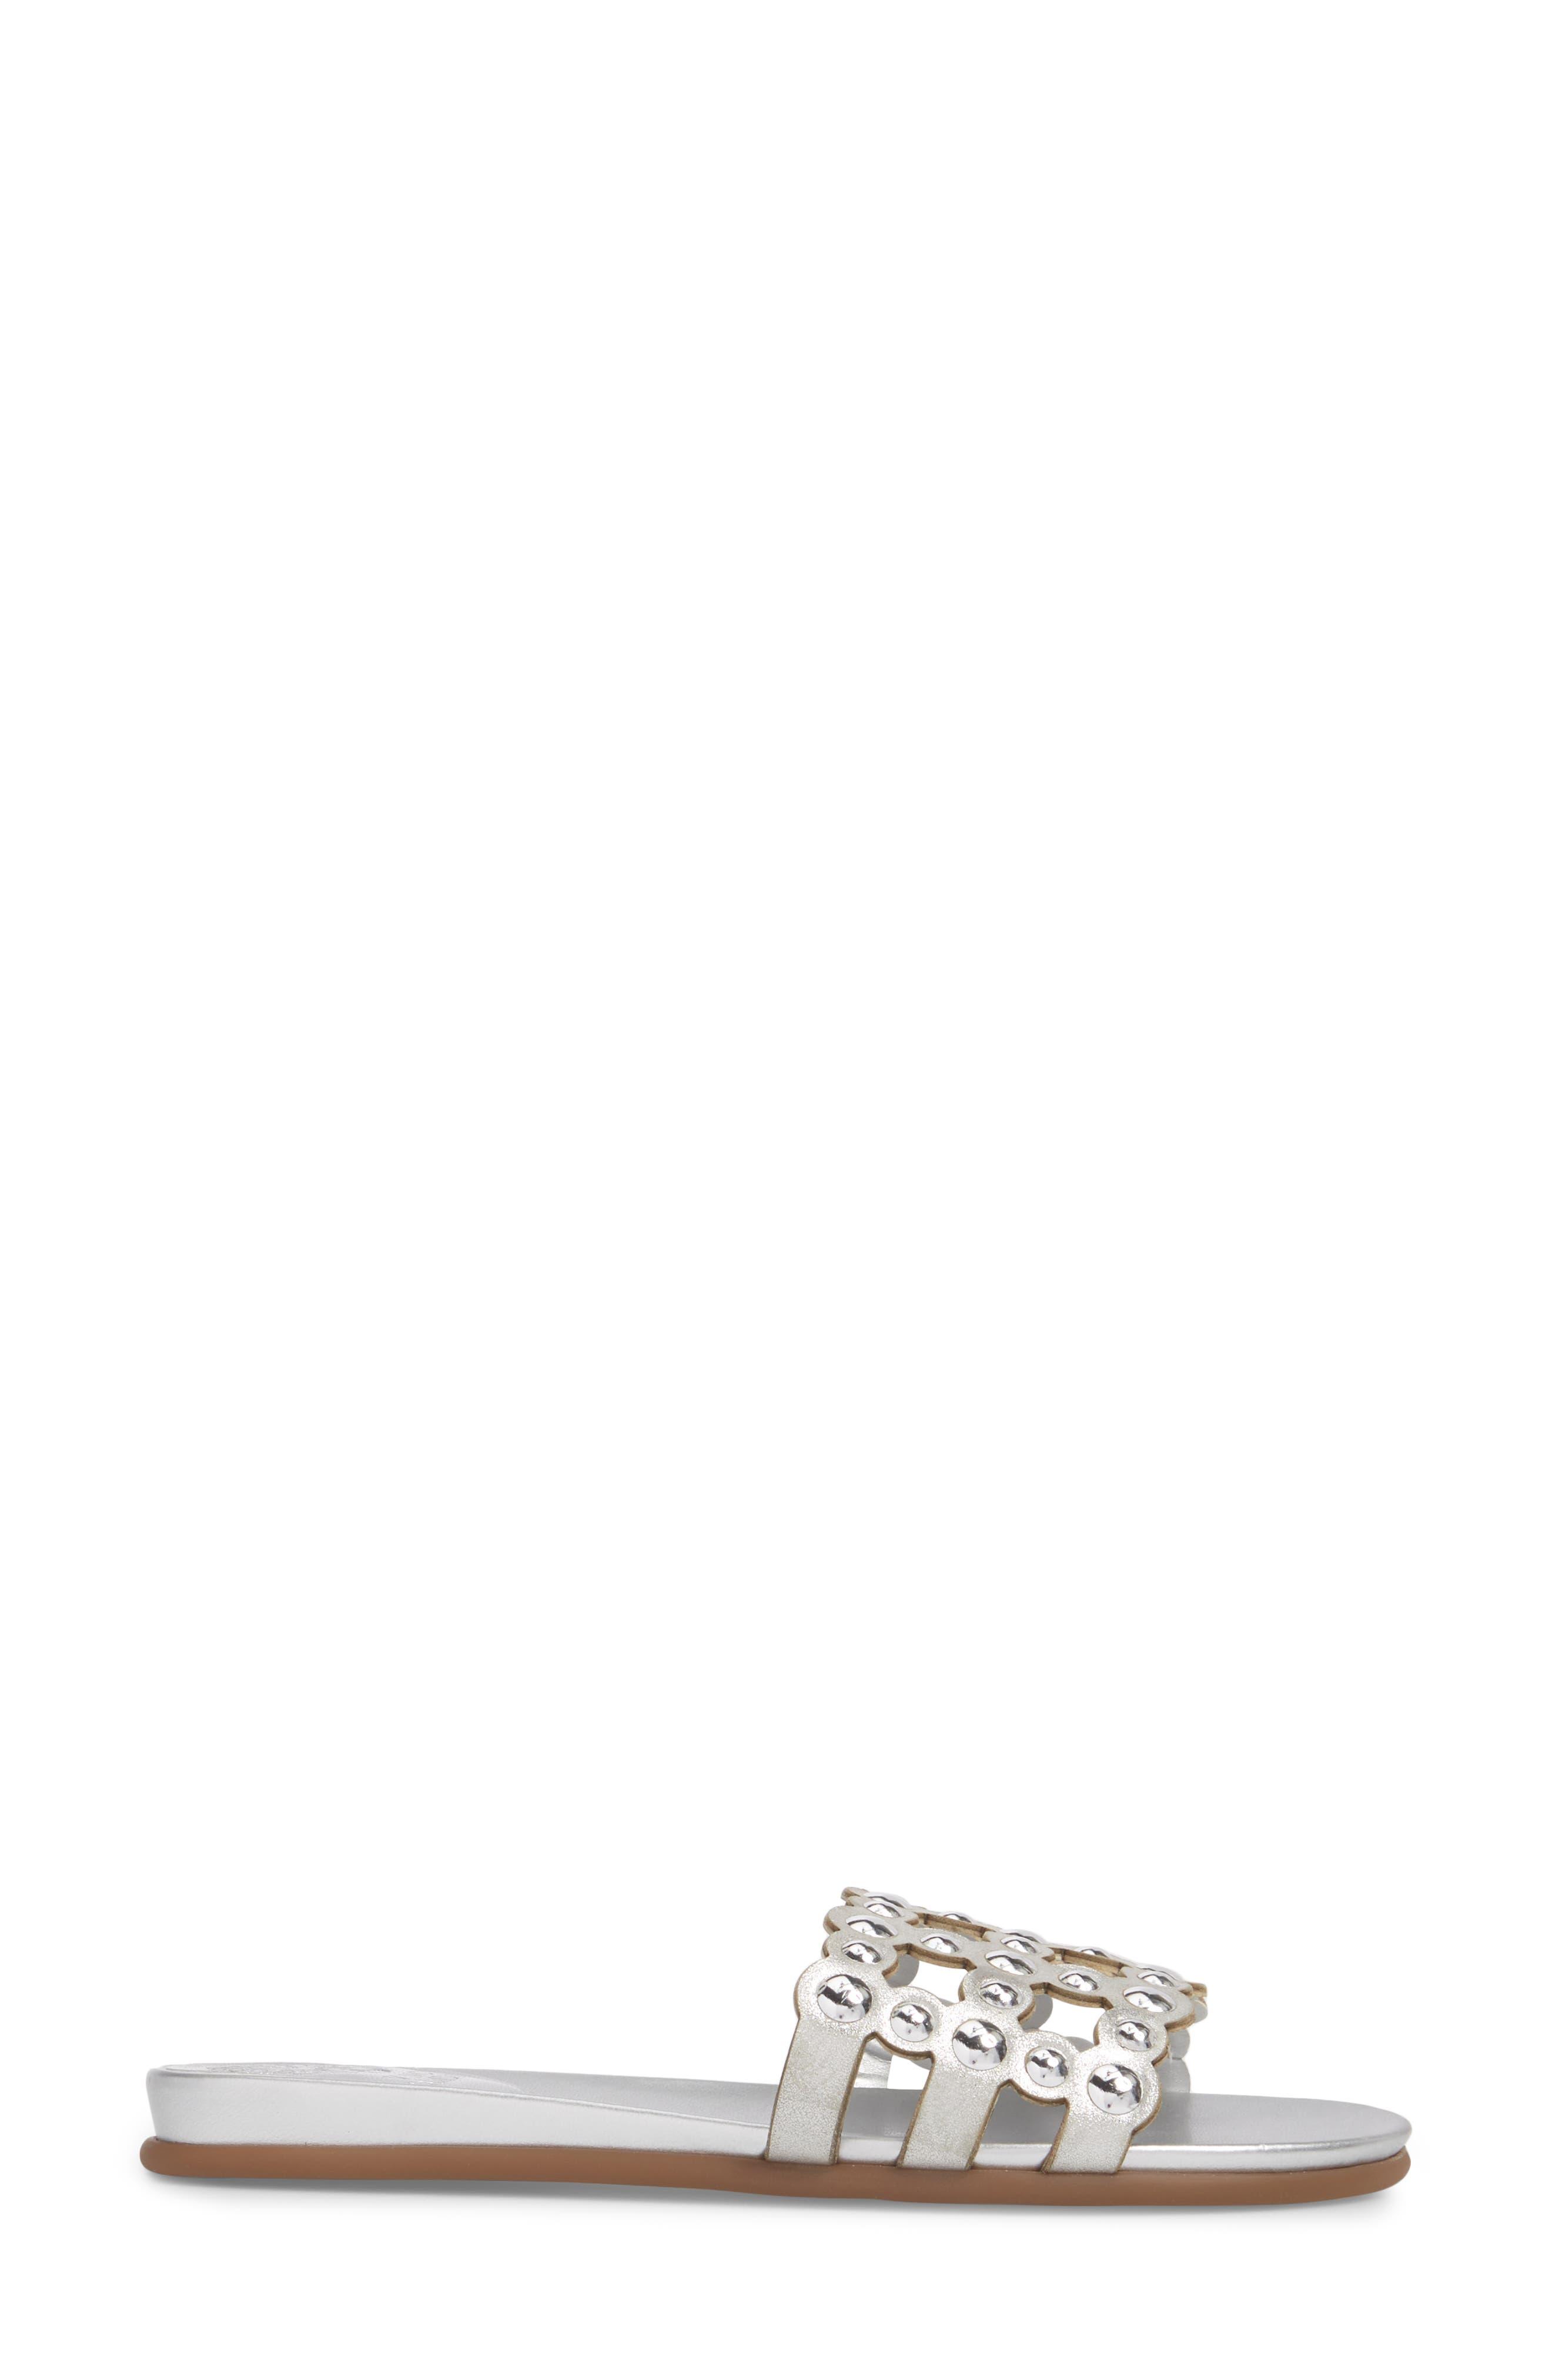 Ellanna Studded Slide Sandal,                             Alternate thumbnail 3, color,                             Gleaming Silver Leather